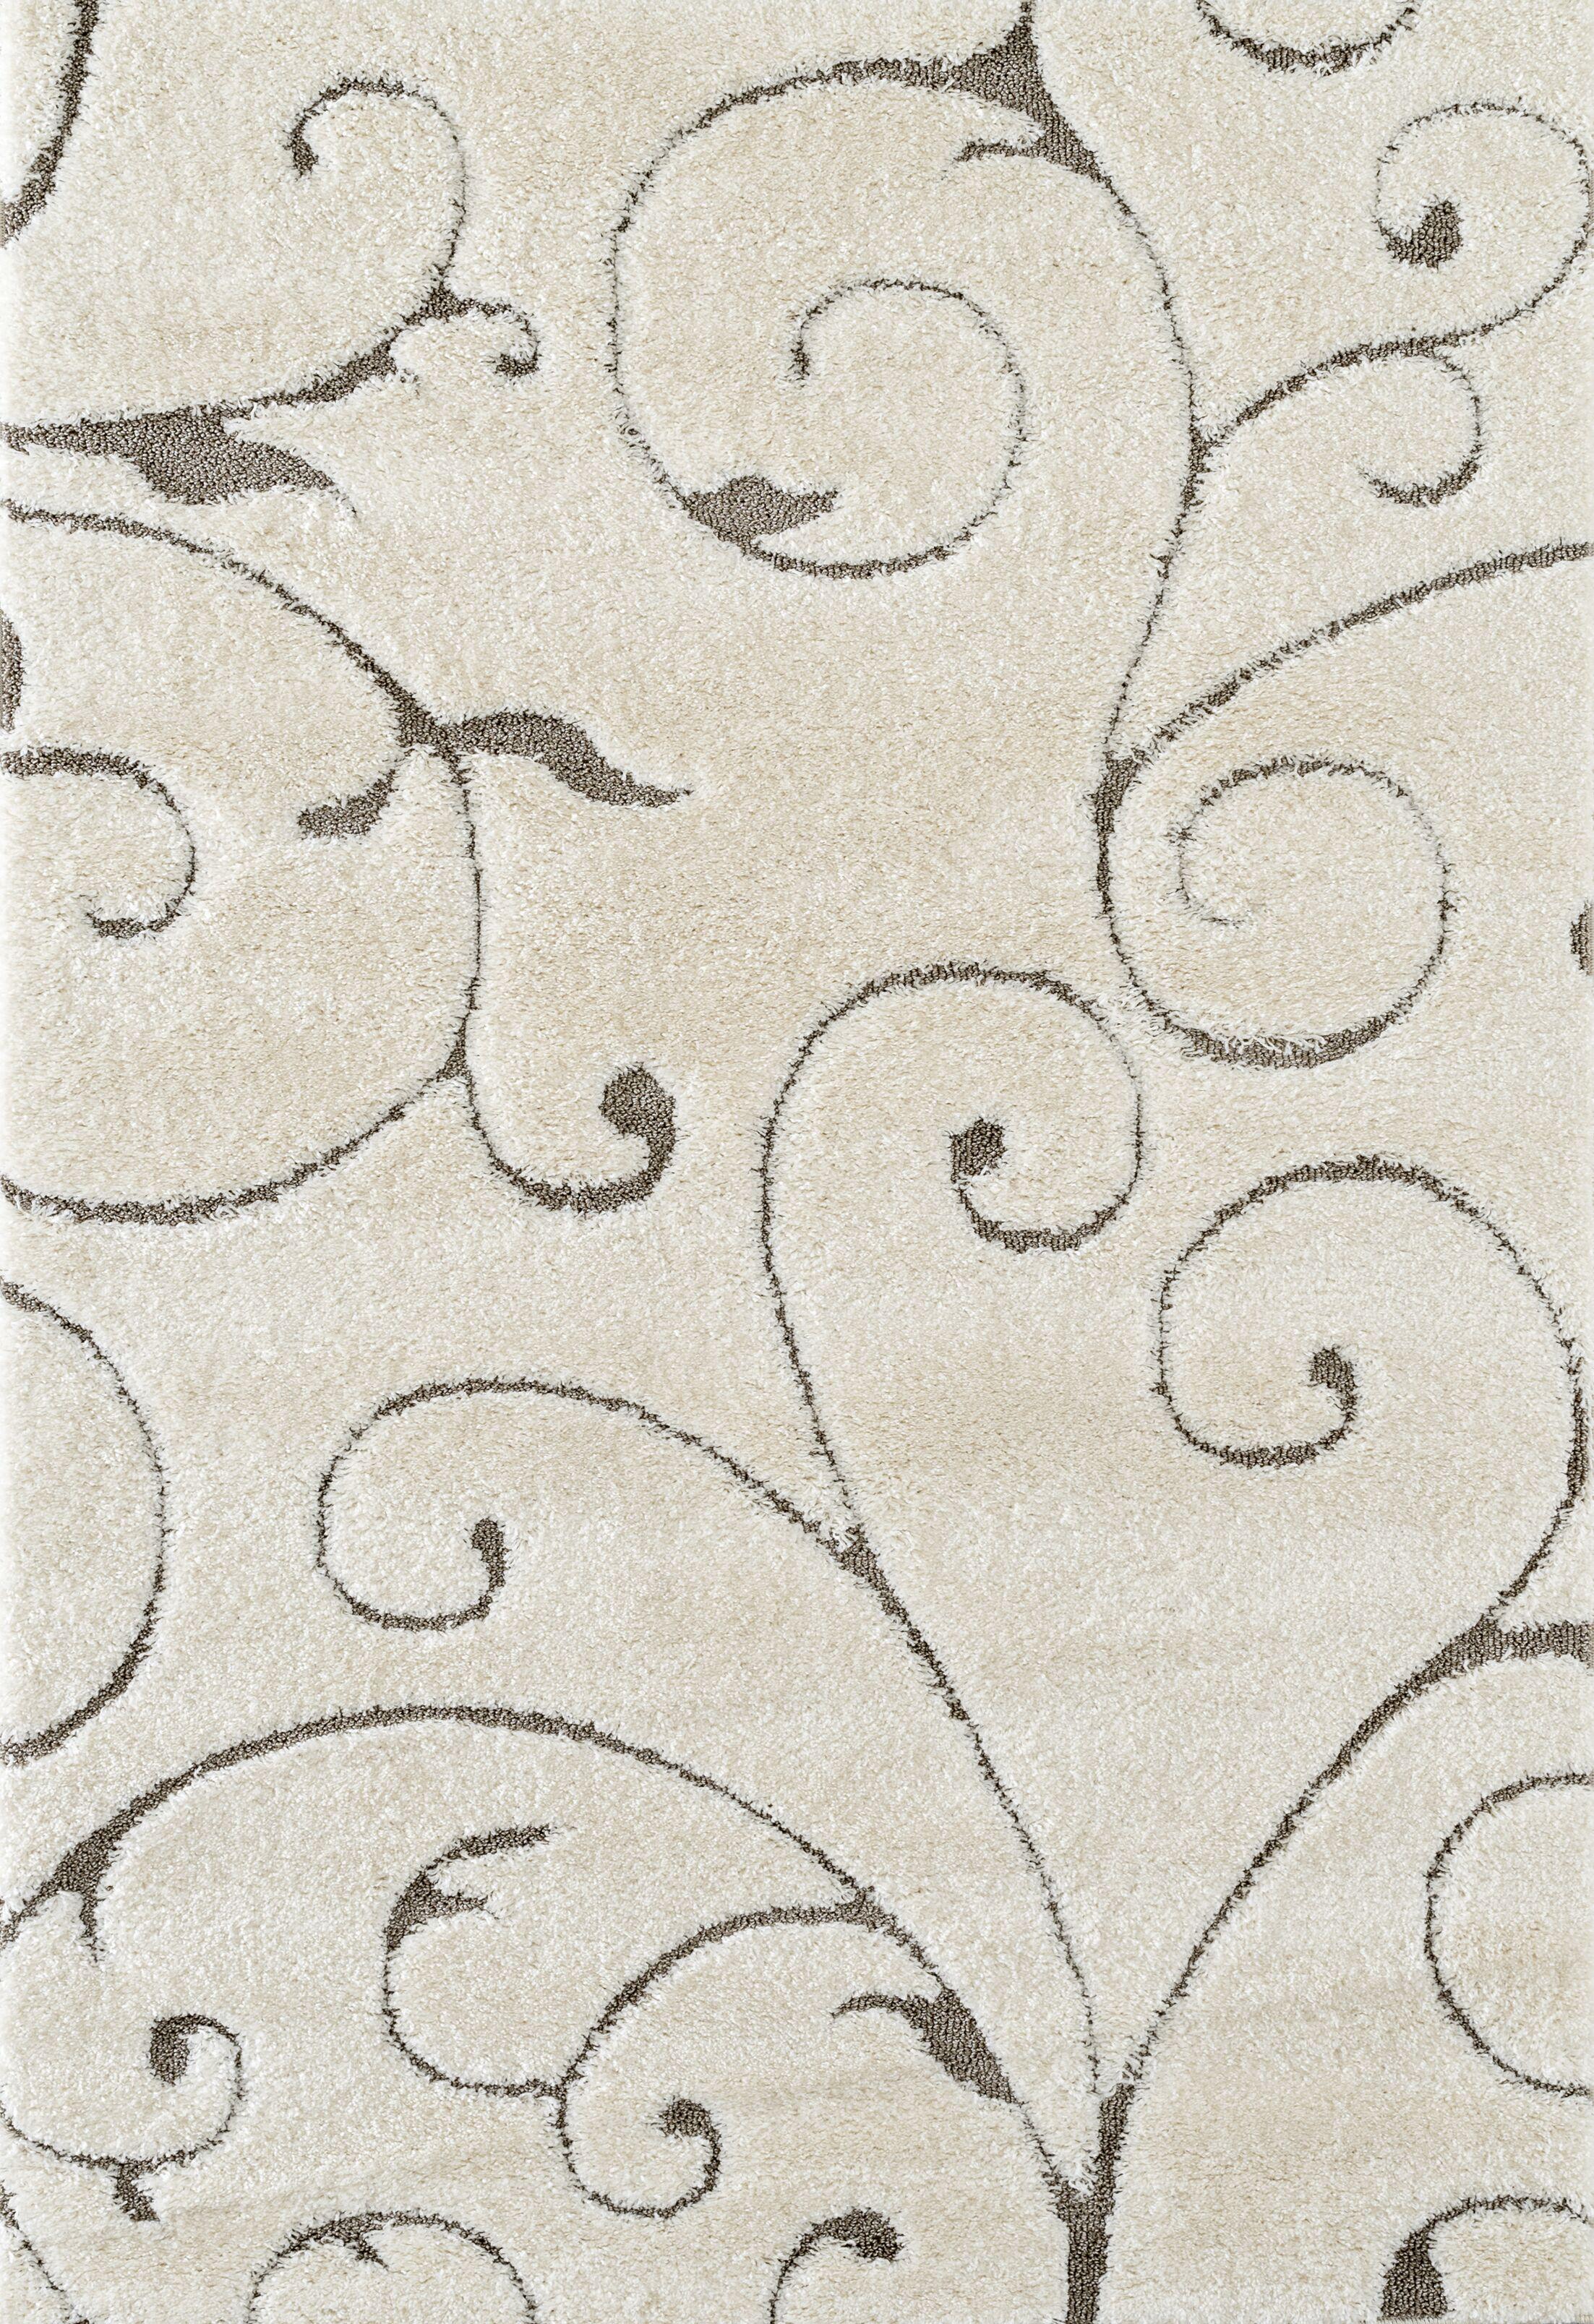 Dostie Cream Area Rug Rug Size: Rectangle 7'9